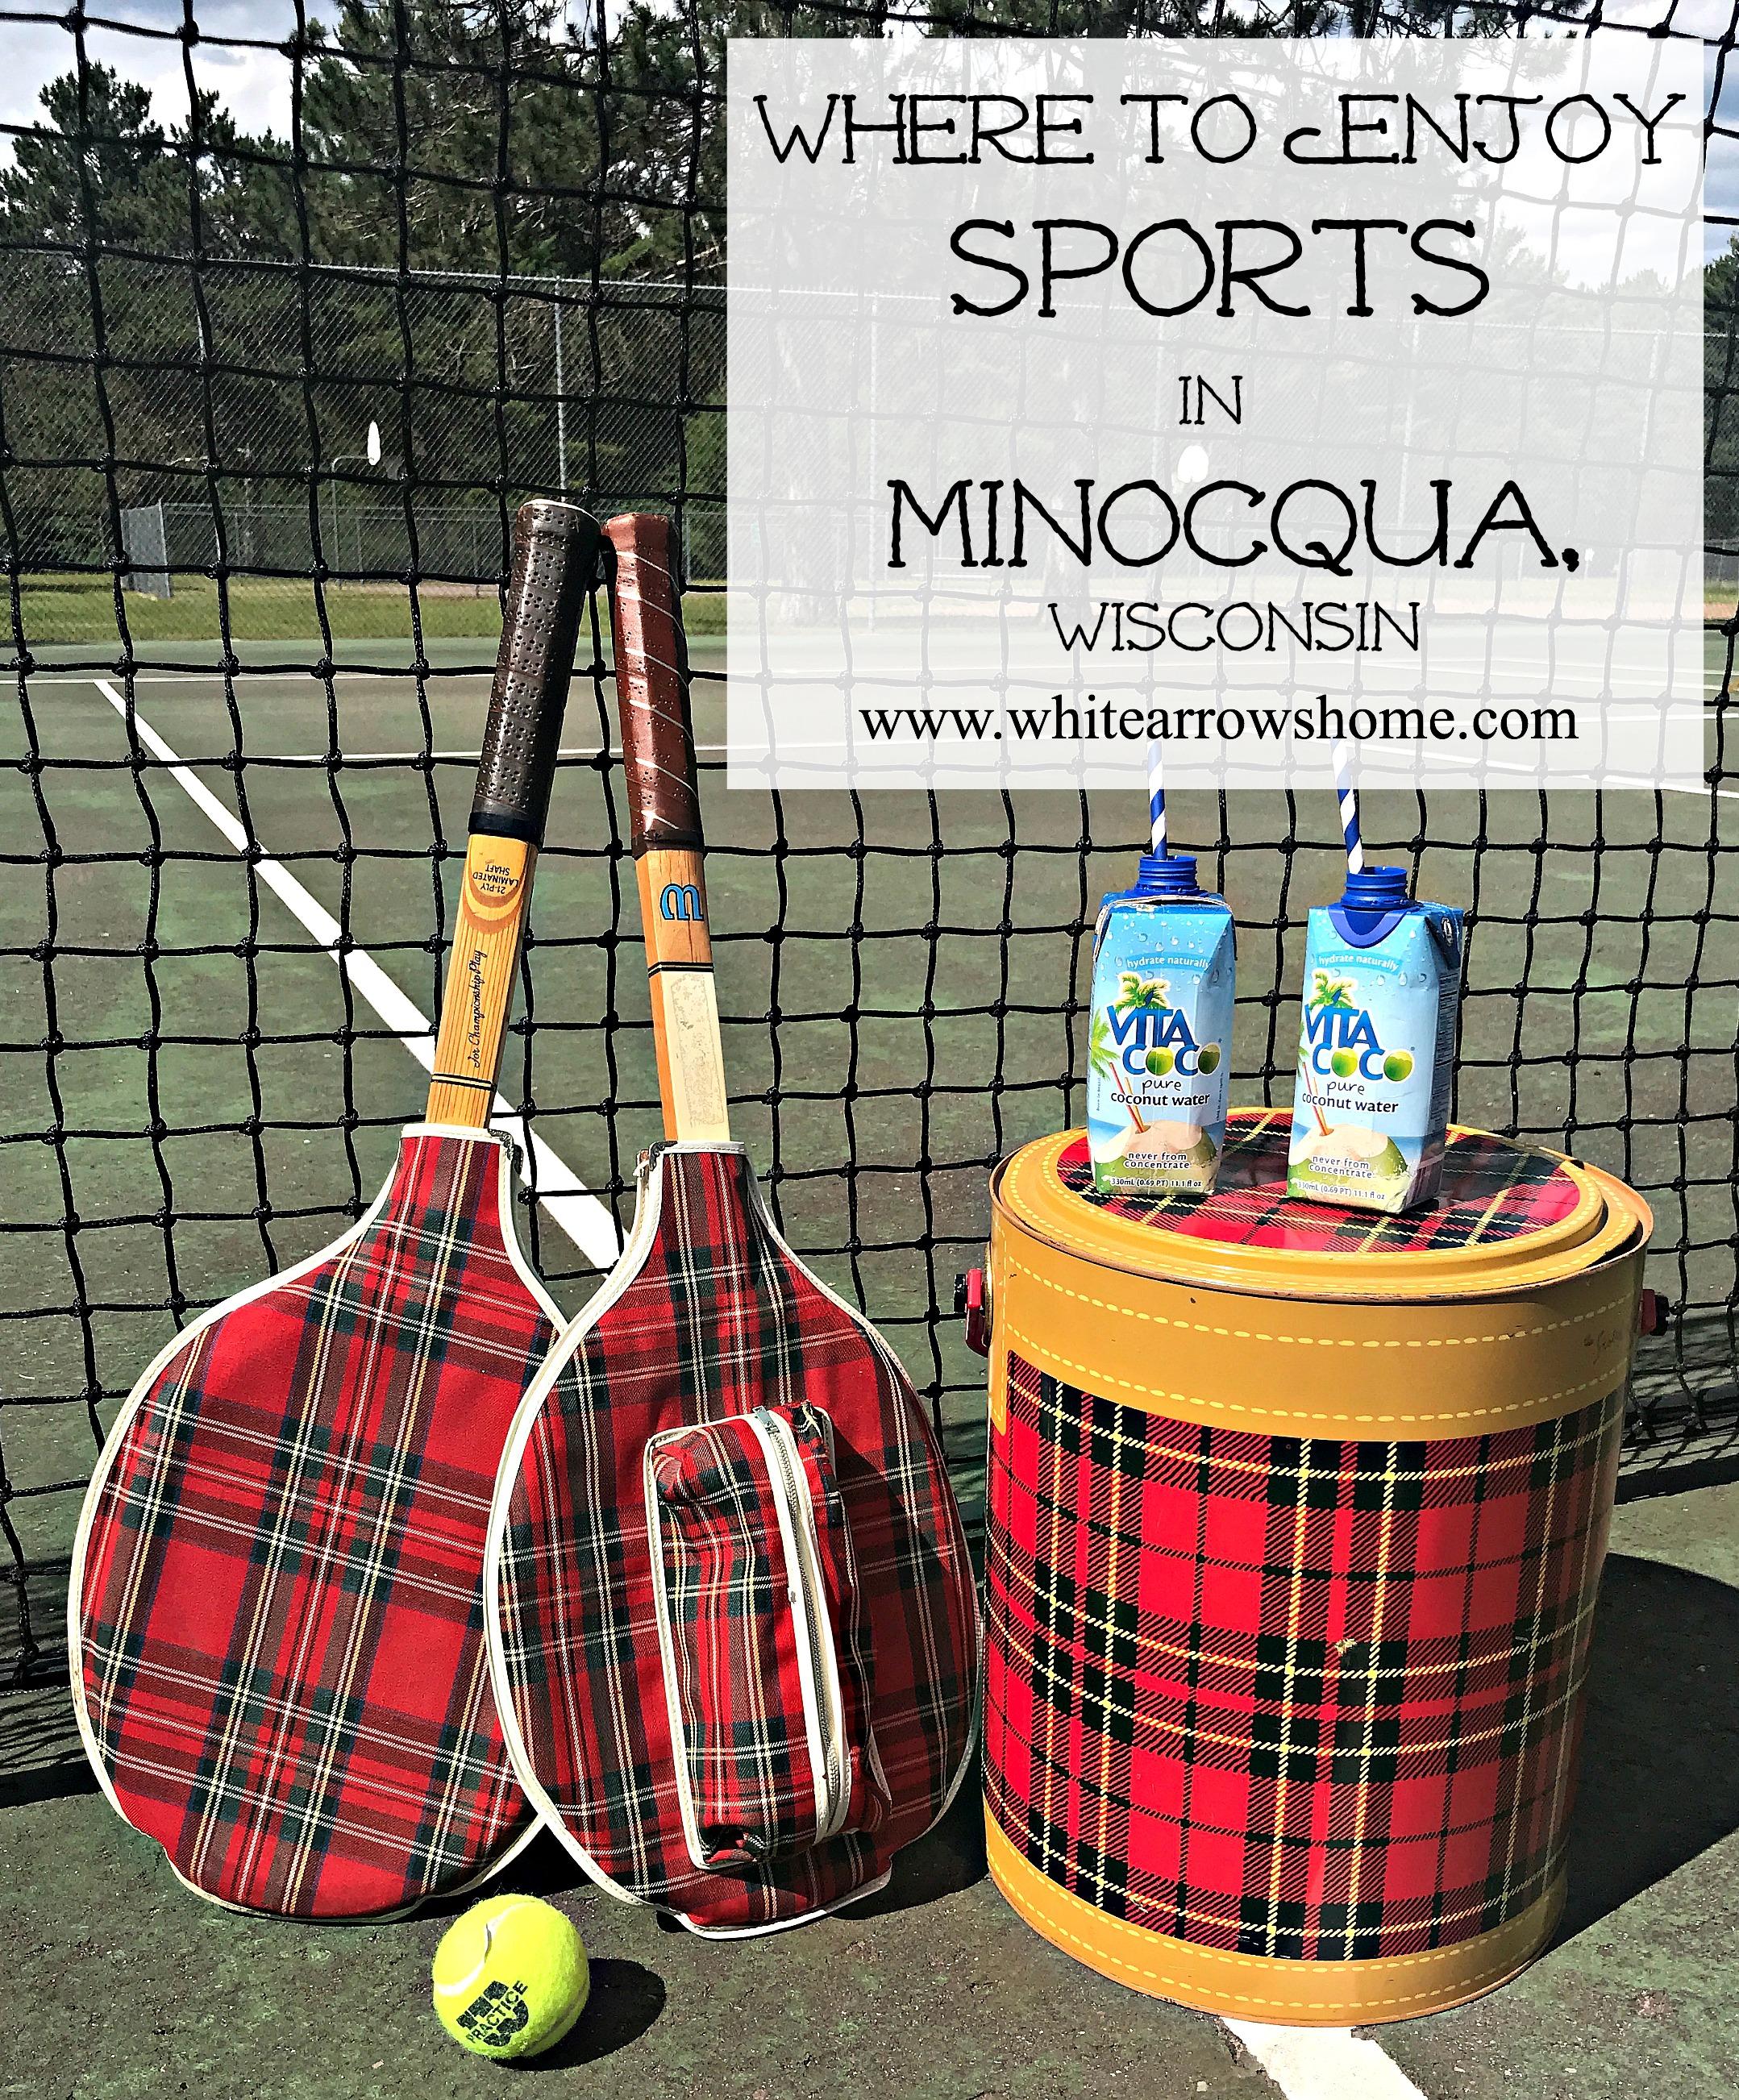 Vintage Tennis, Minocqua, Scotch Cooler, Sports, Visit Minocqua